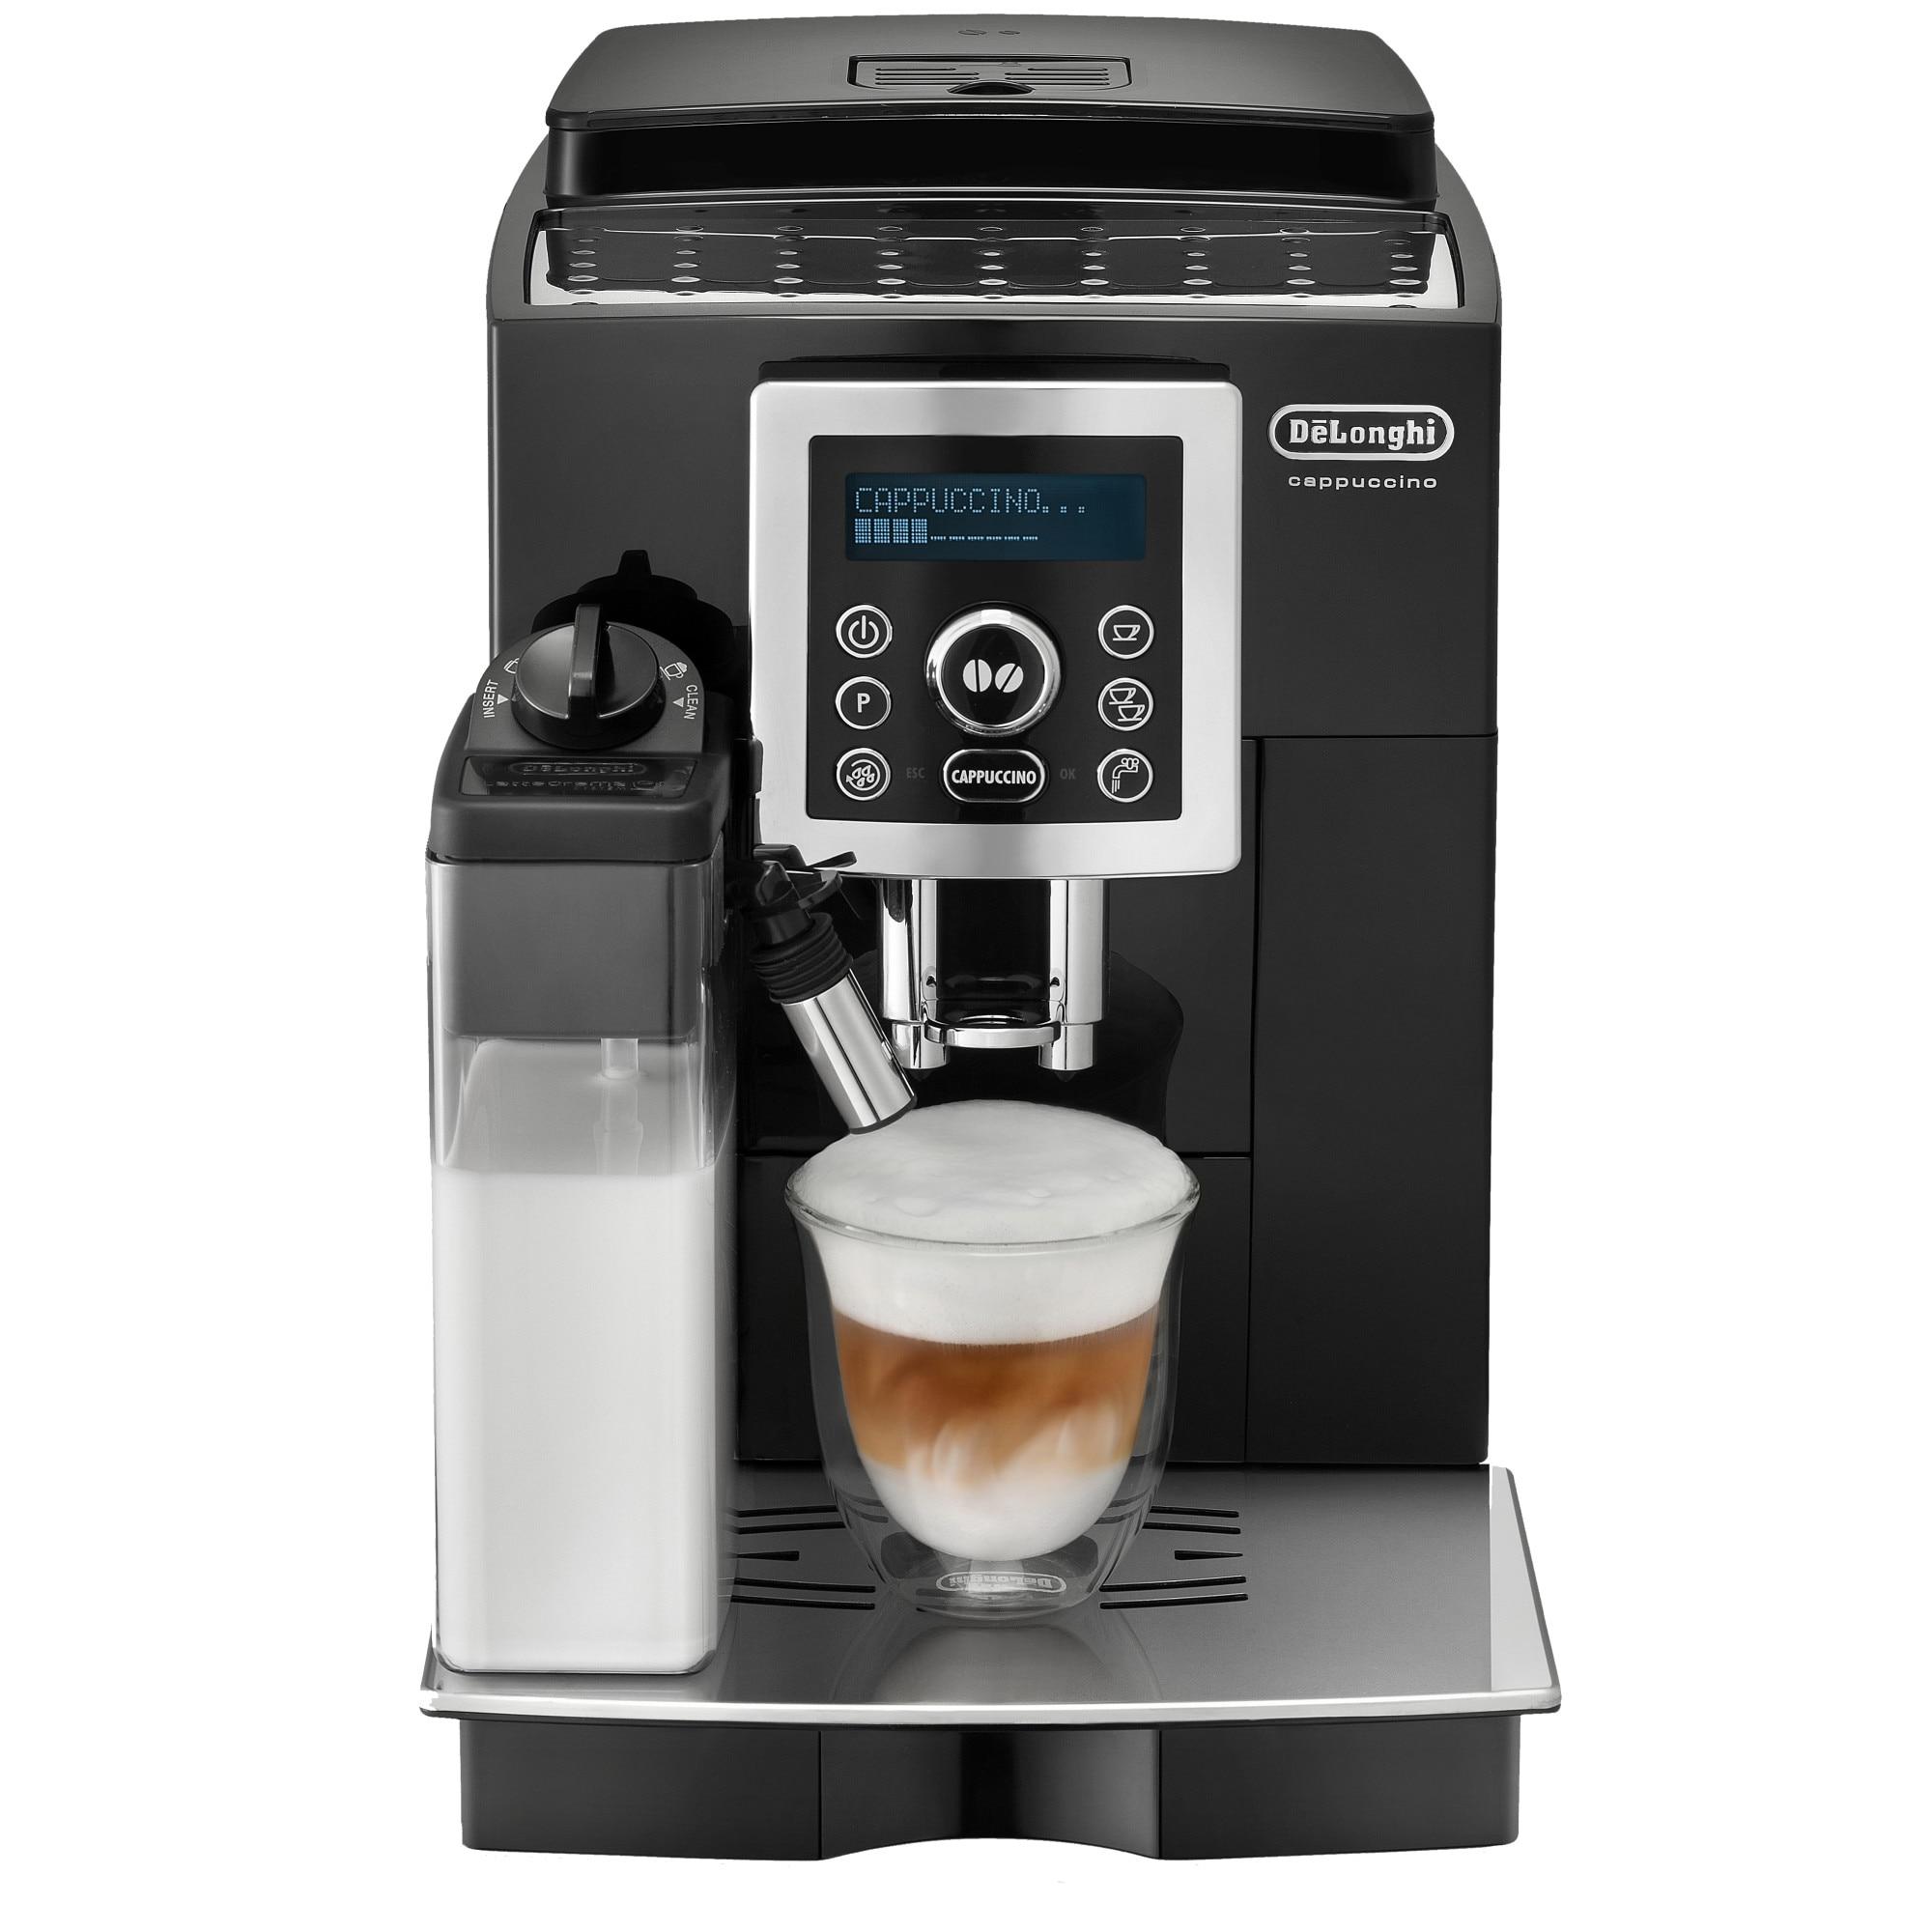 Fotografie Espressor automat De'Longhi ECAM 23.460 B, 1450 W, 15 bar, LatteCrema system, 1.8 l, Negru